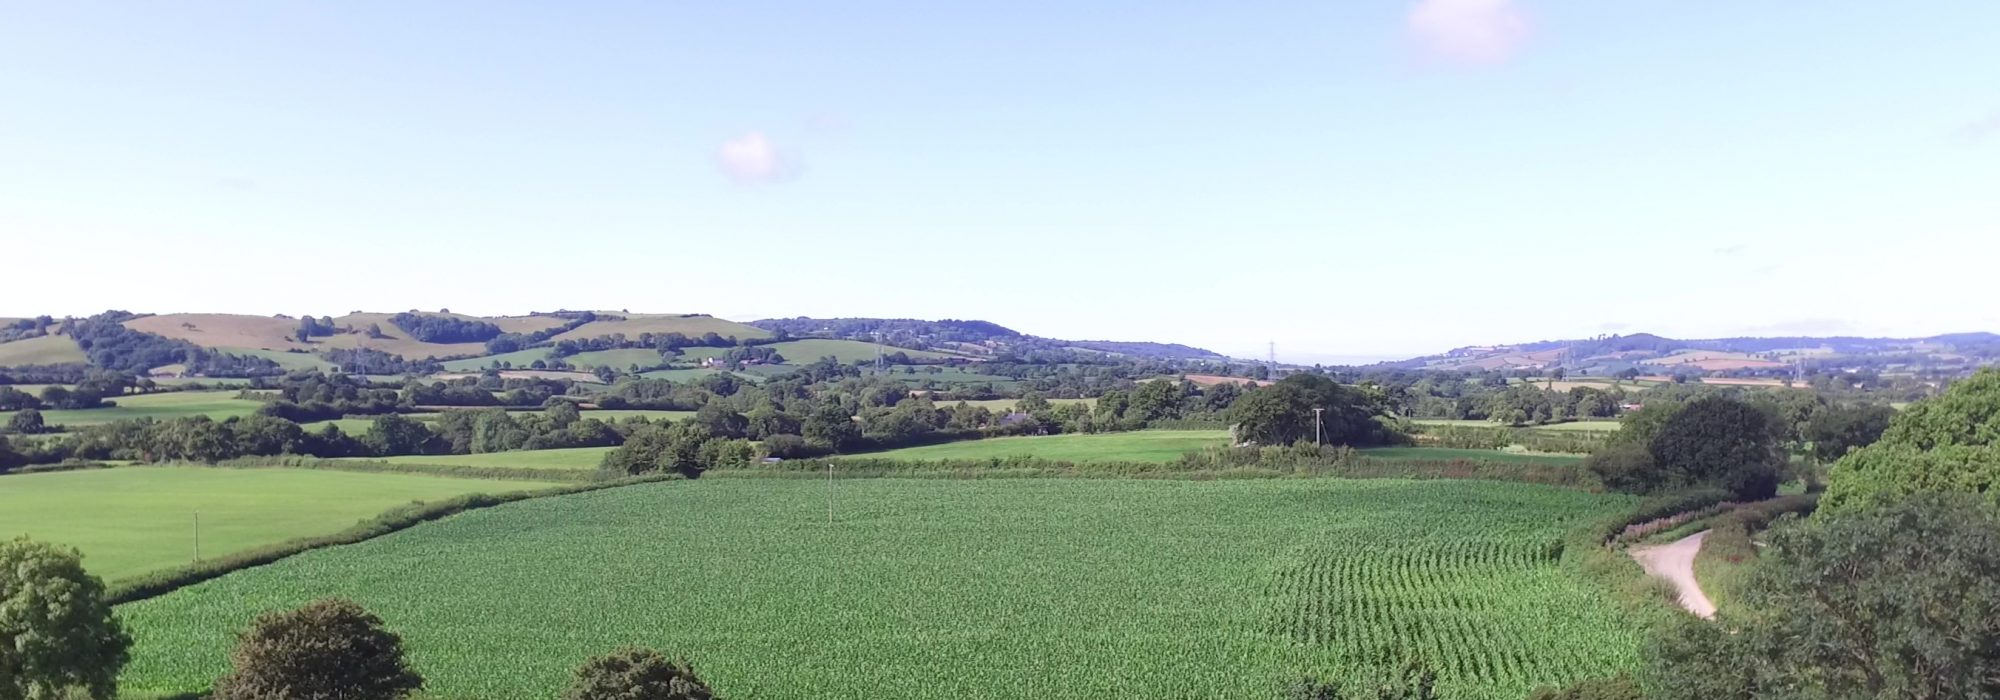 countryside photo 3